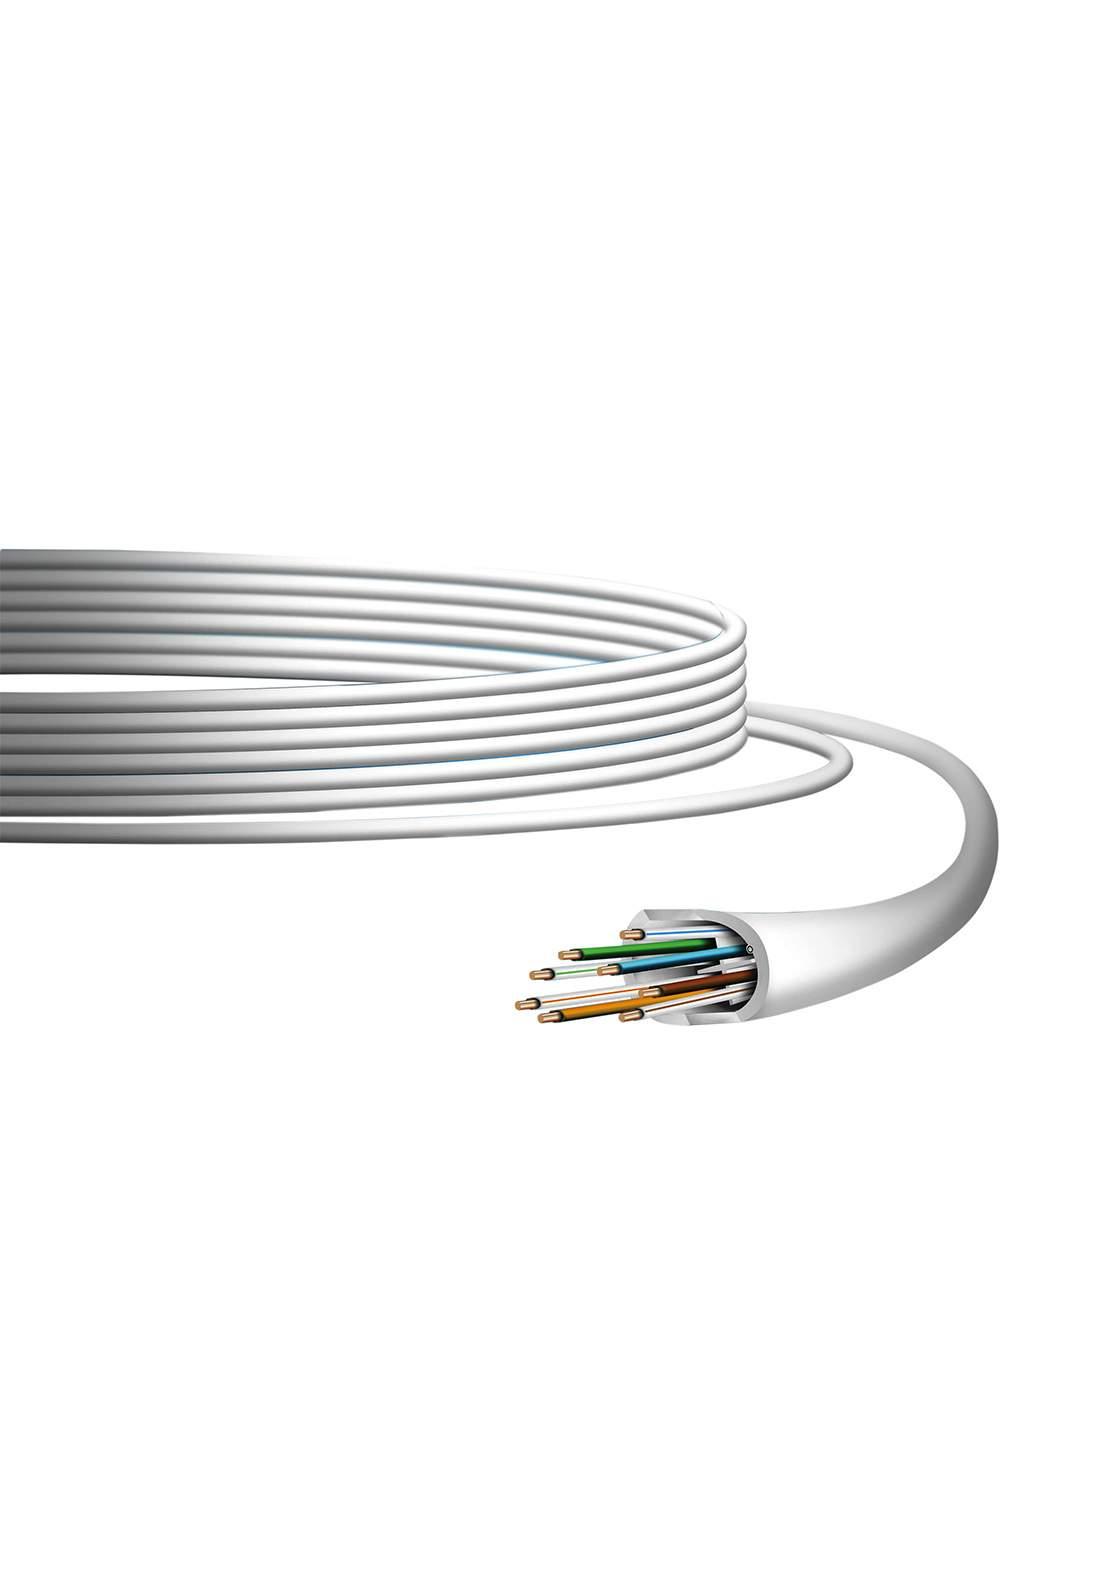 Ubiquiti Networks UniFi Cat 6 Indoor Ethernet Cable - White كابل